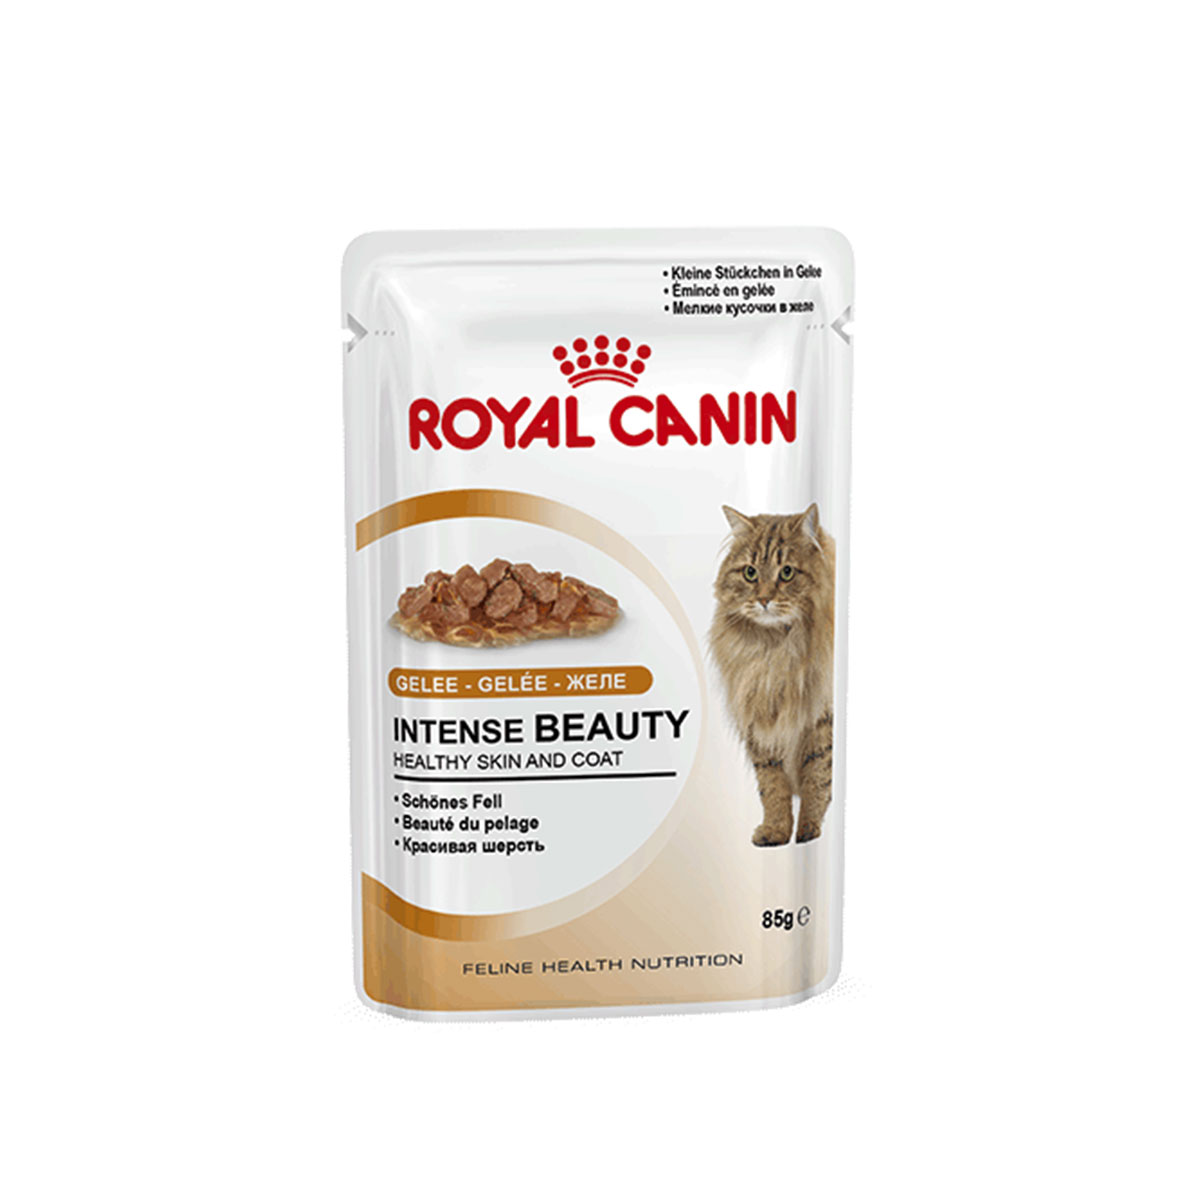 royal canin katzenfutter intense beauty in gelee 12x85g. Black Bedroom Furniture Sets. Home Design Ideas